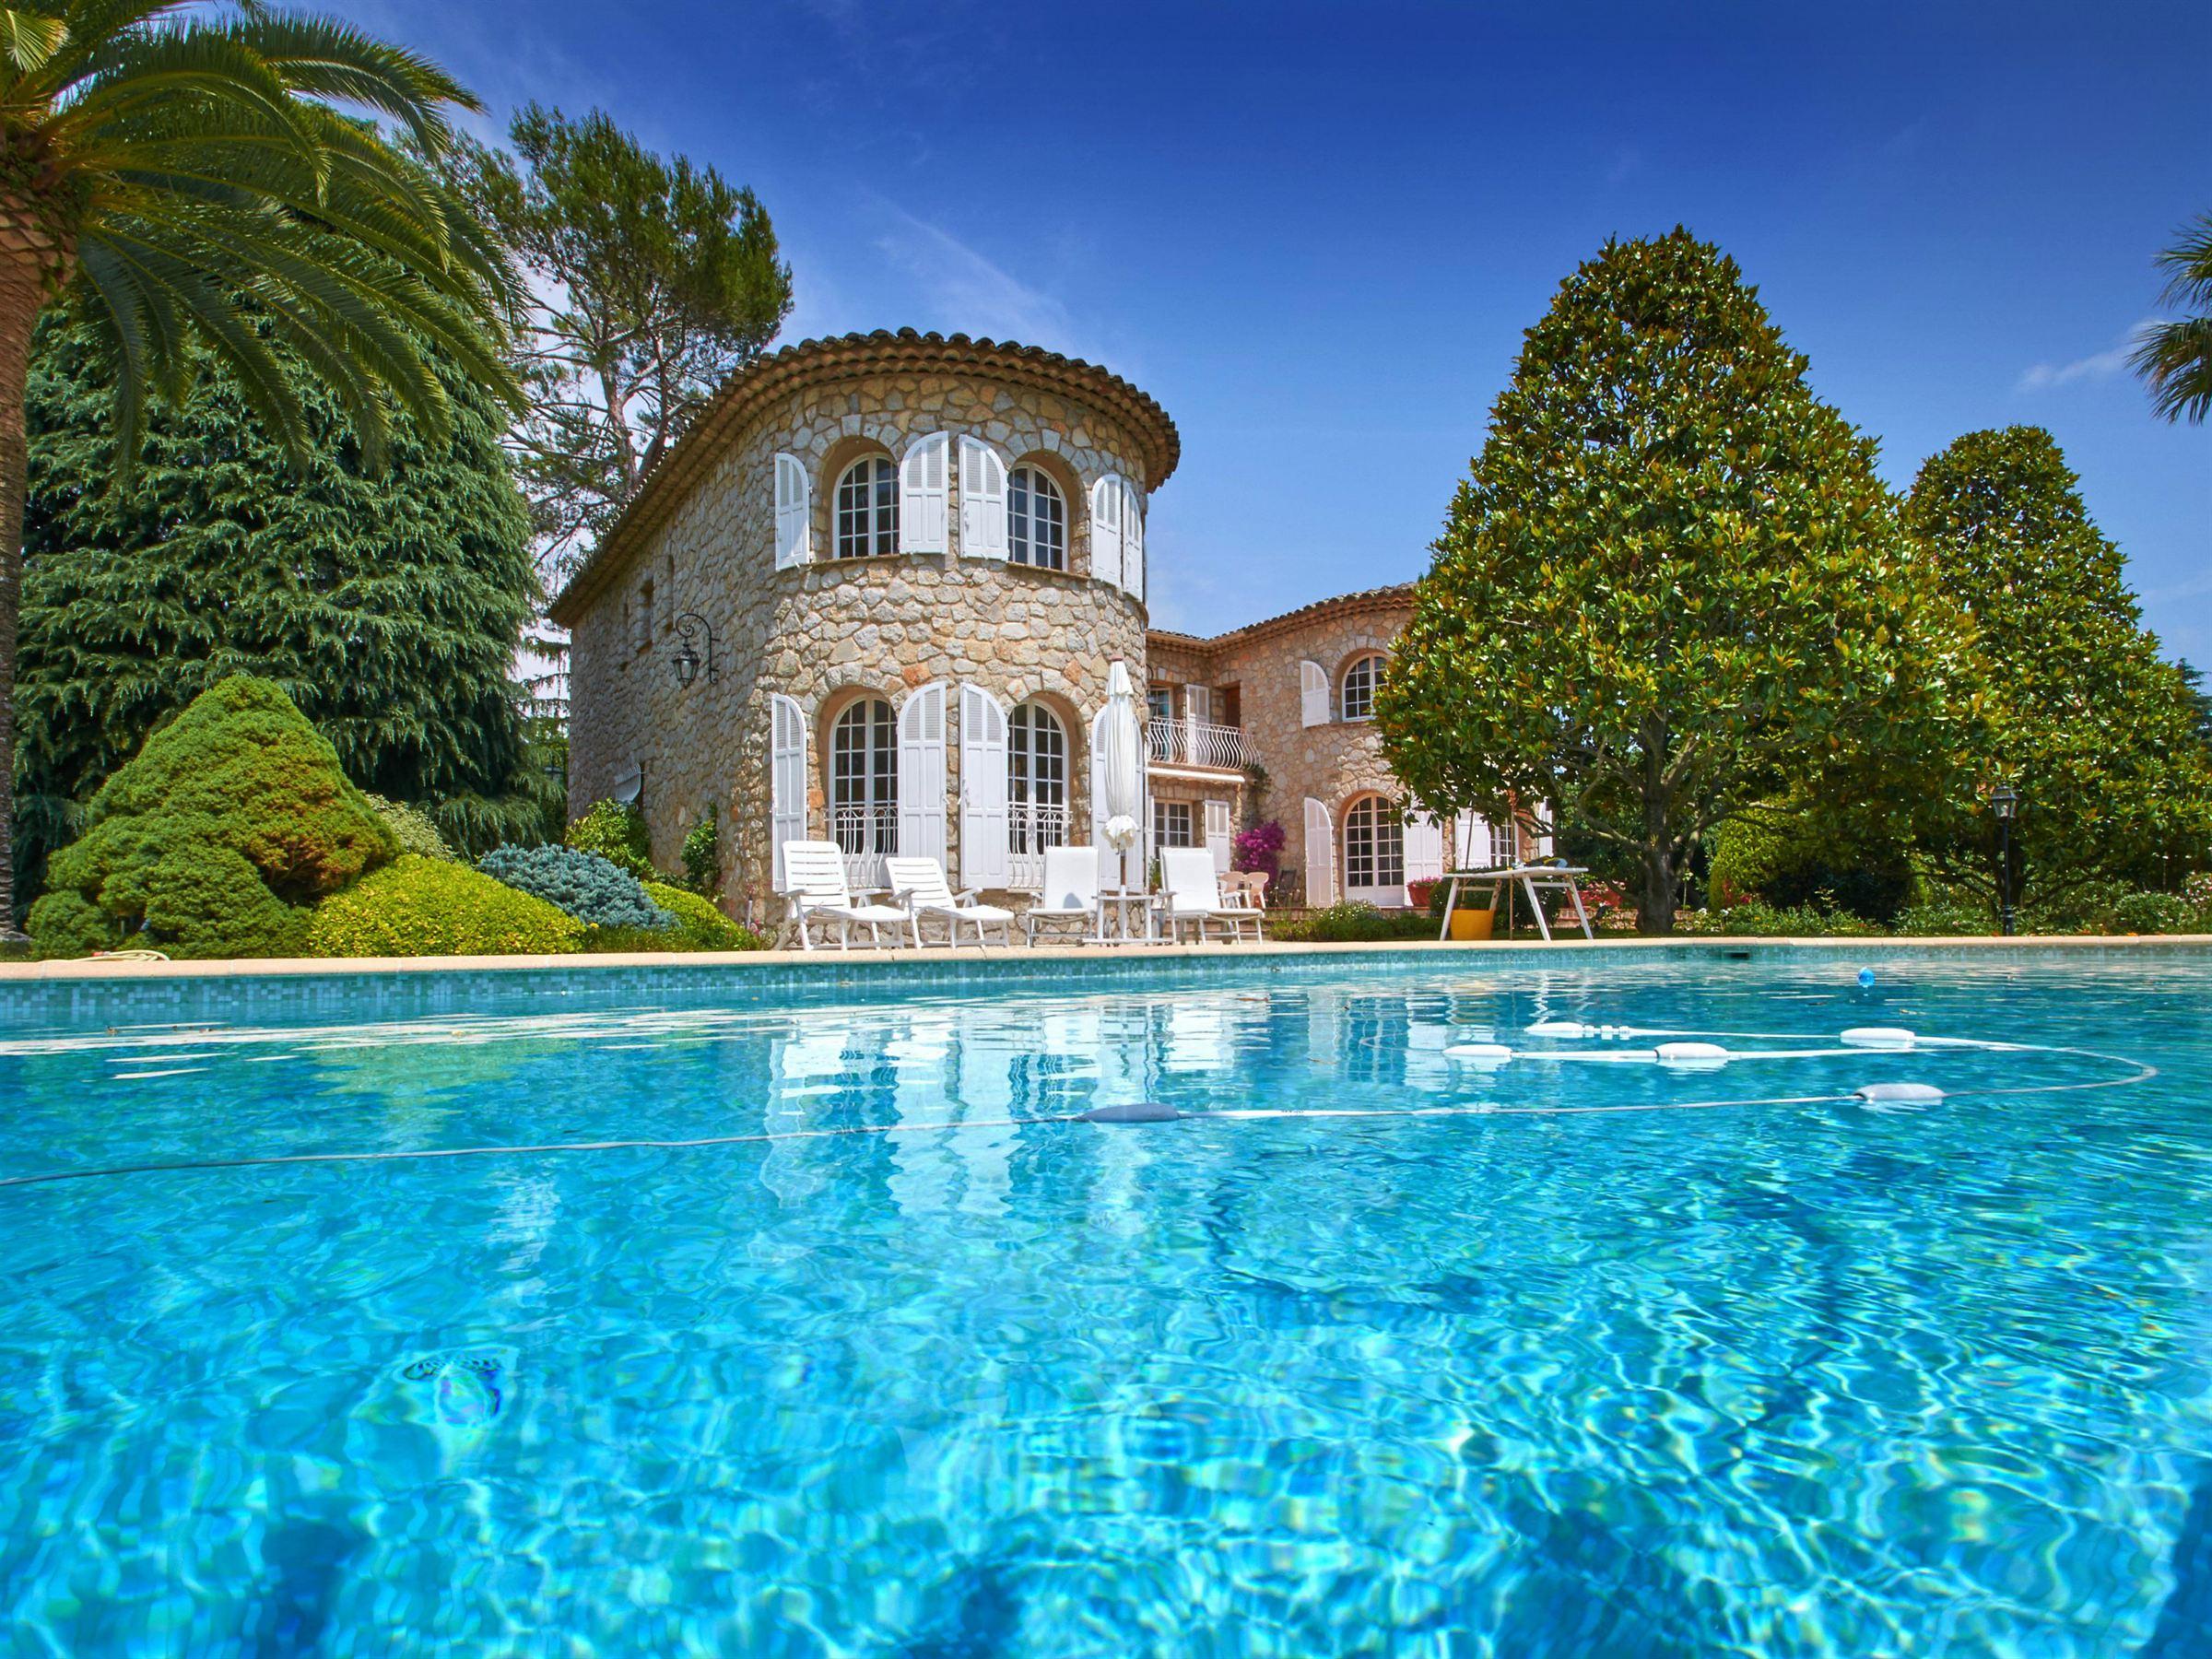 Einfamilienhaus für Verkauf beim Charming stone house in a private domain of Mougins Mougins, Provence-Alpes-Cote D'Azur, 06250 Frankreich